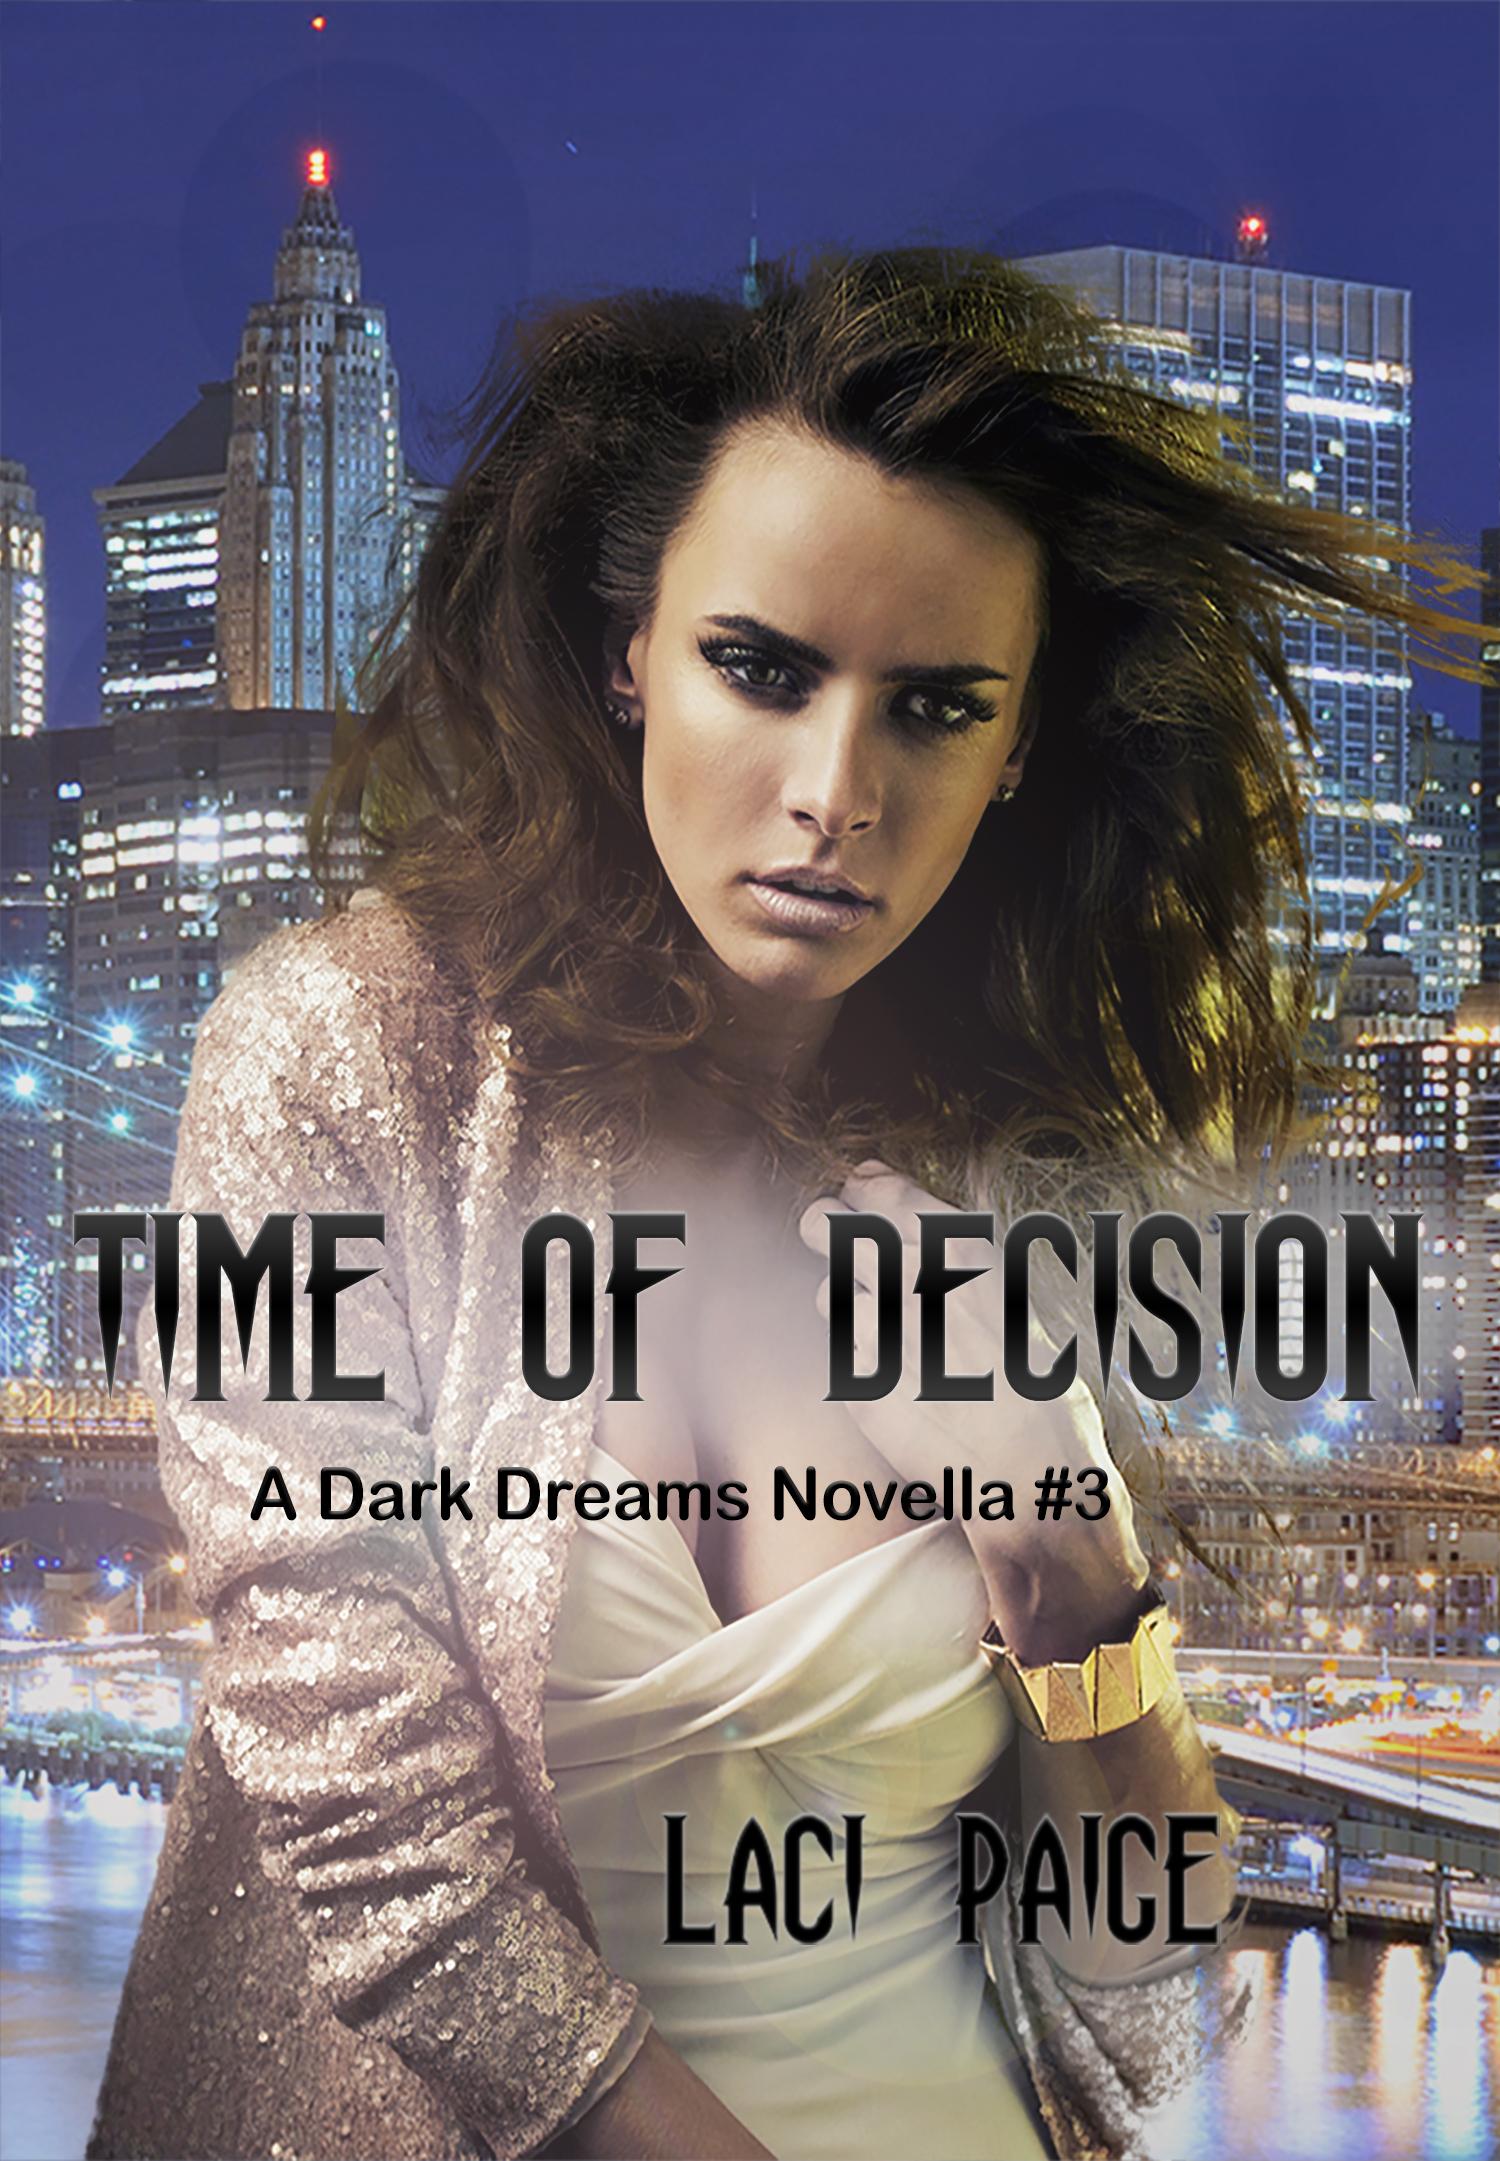 Time of Decision - Dark Dreams #3  Paranormal Novella